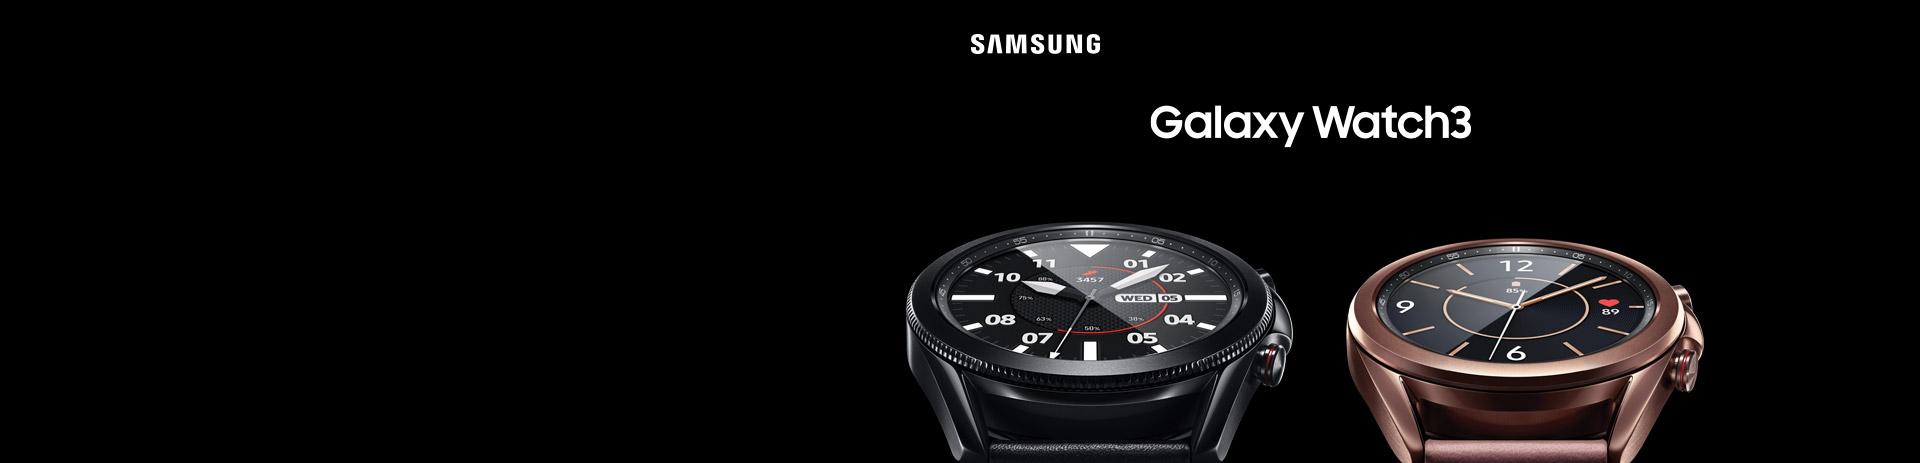 Samsung Galaxy Watch Active3